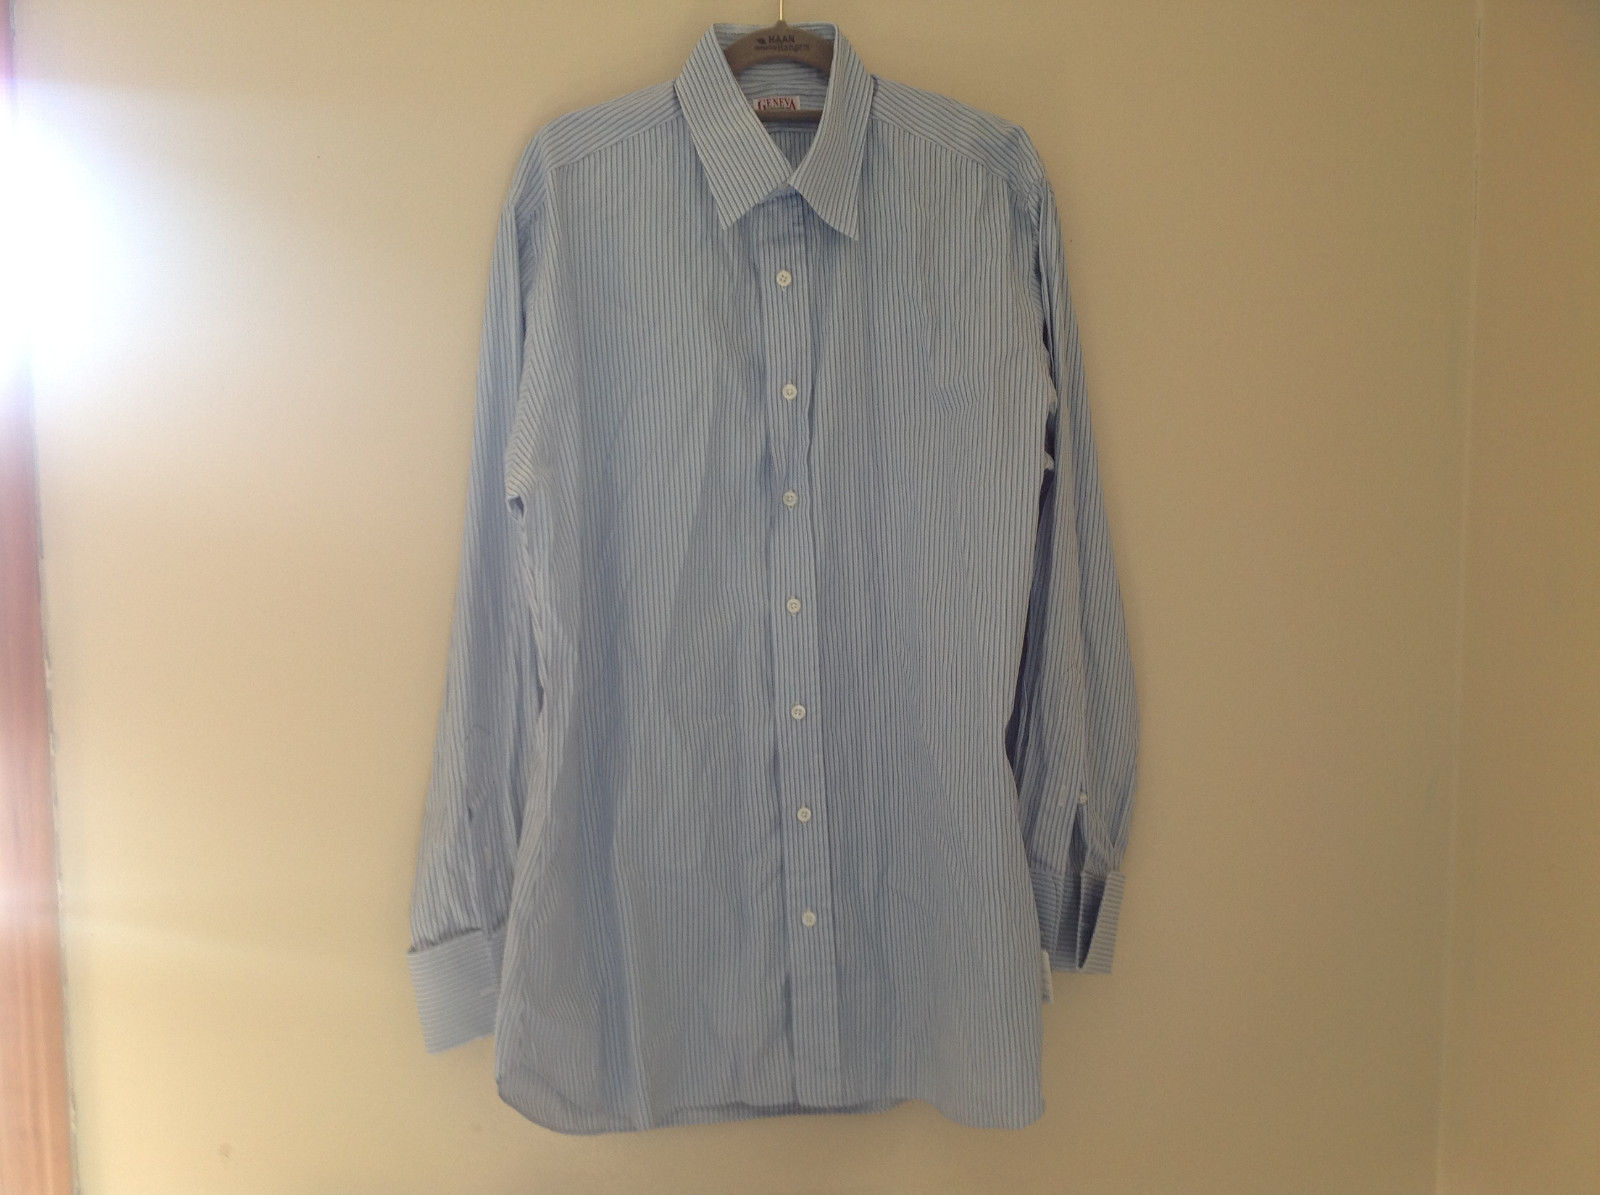 Geneva Custom Light Blue Striped Casual Collared Long Sleeve Button Up Shirt